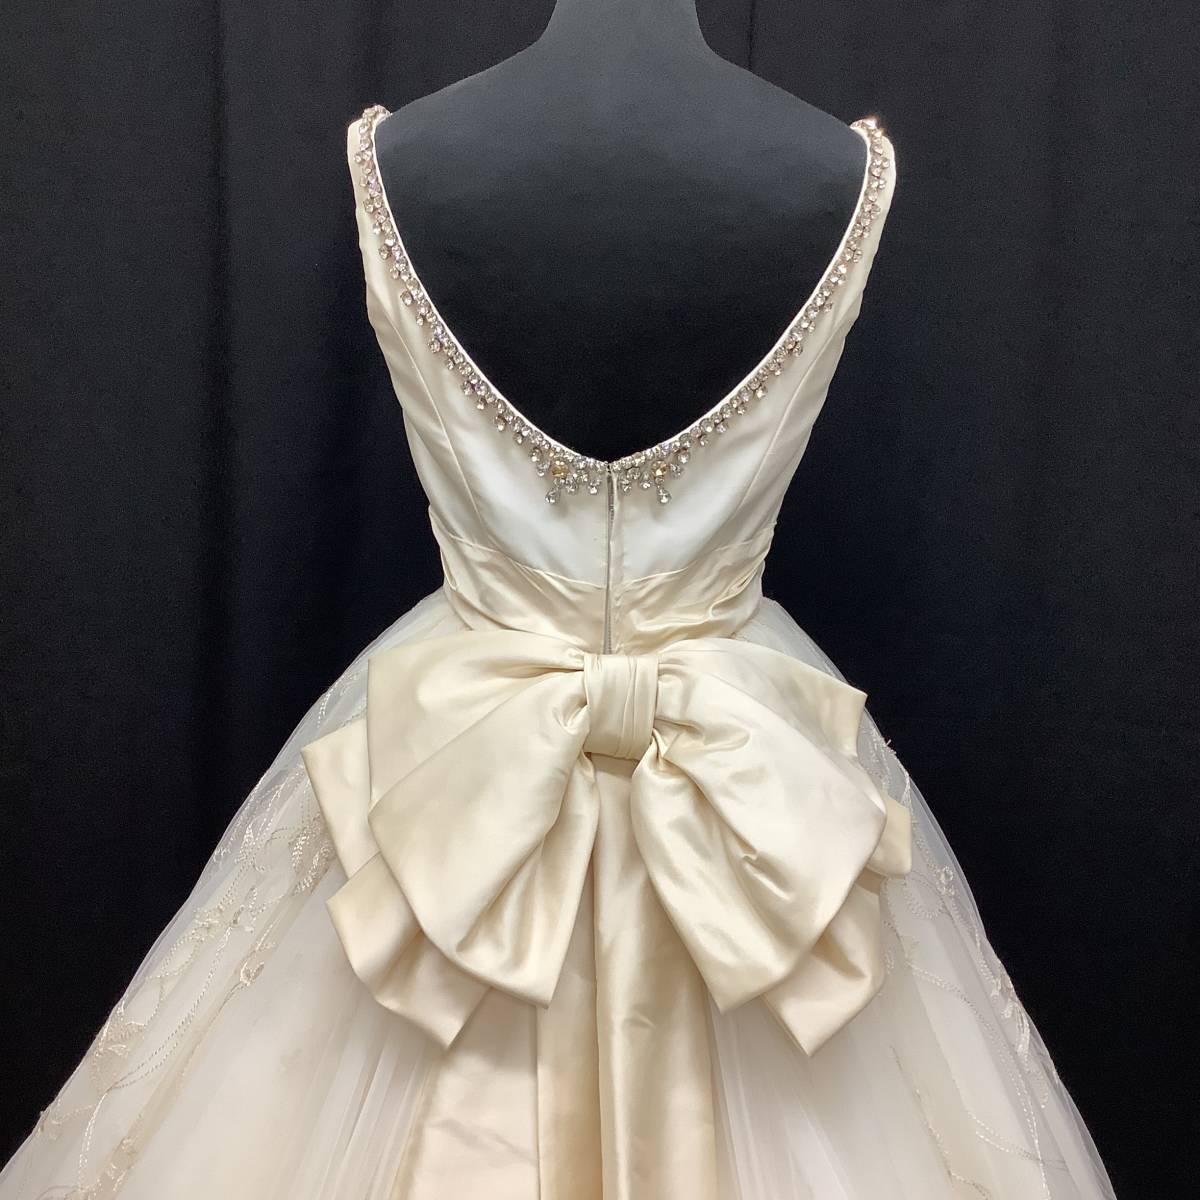 【GRACE CONTINENTALグレースコンチネンタル】9号★ミカドサテンに大きめビジュー レースのスカートも上質なドレス